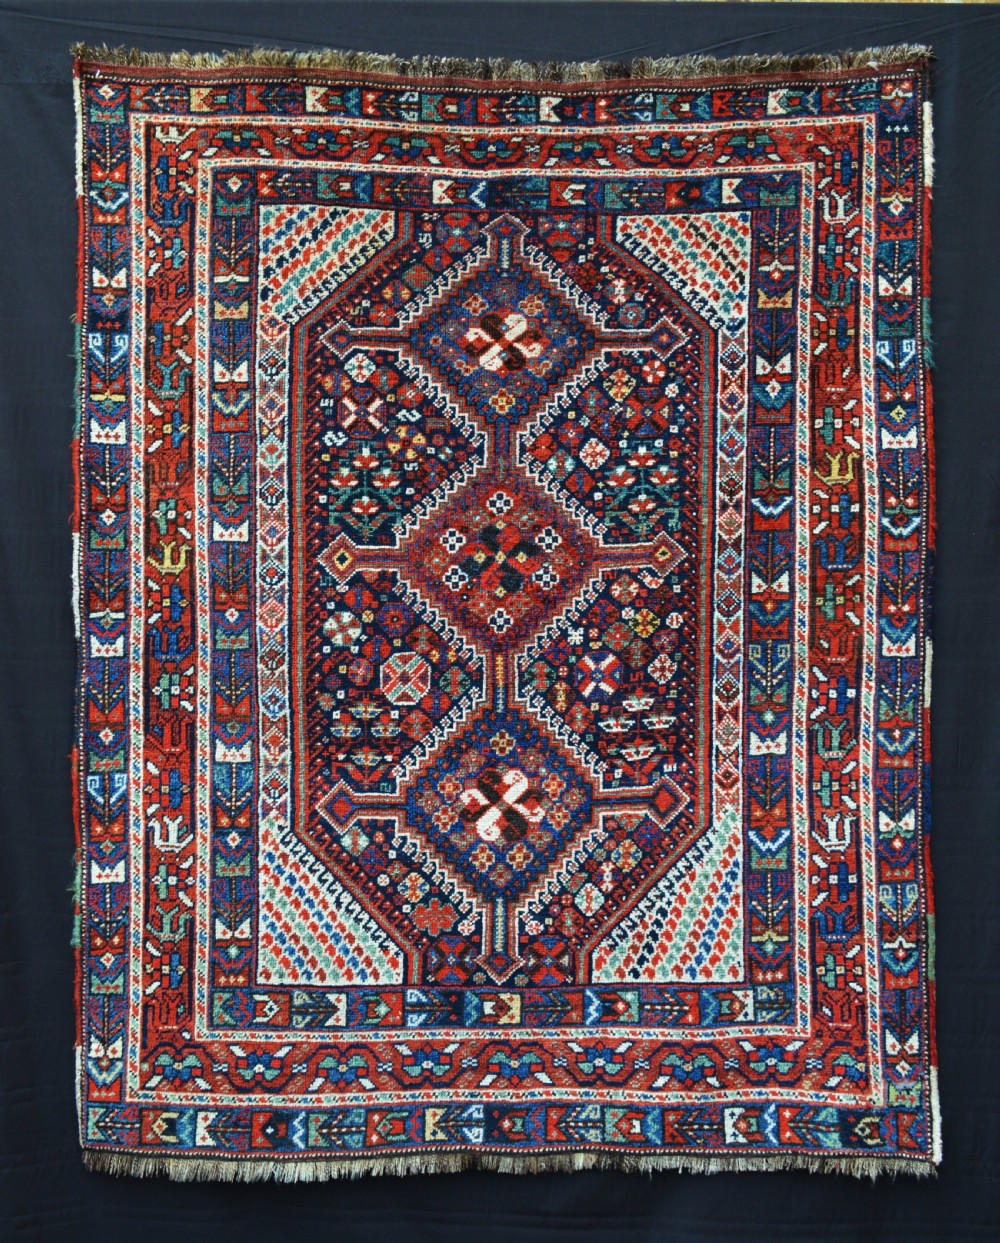 antique khamseh confederacy rug arab ghani tribe fars province southwest persia